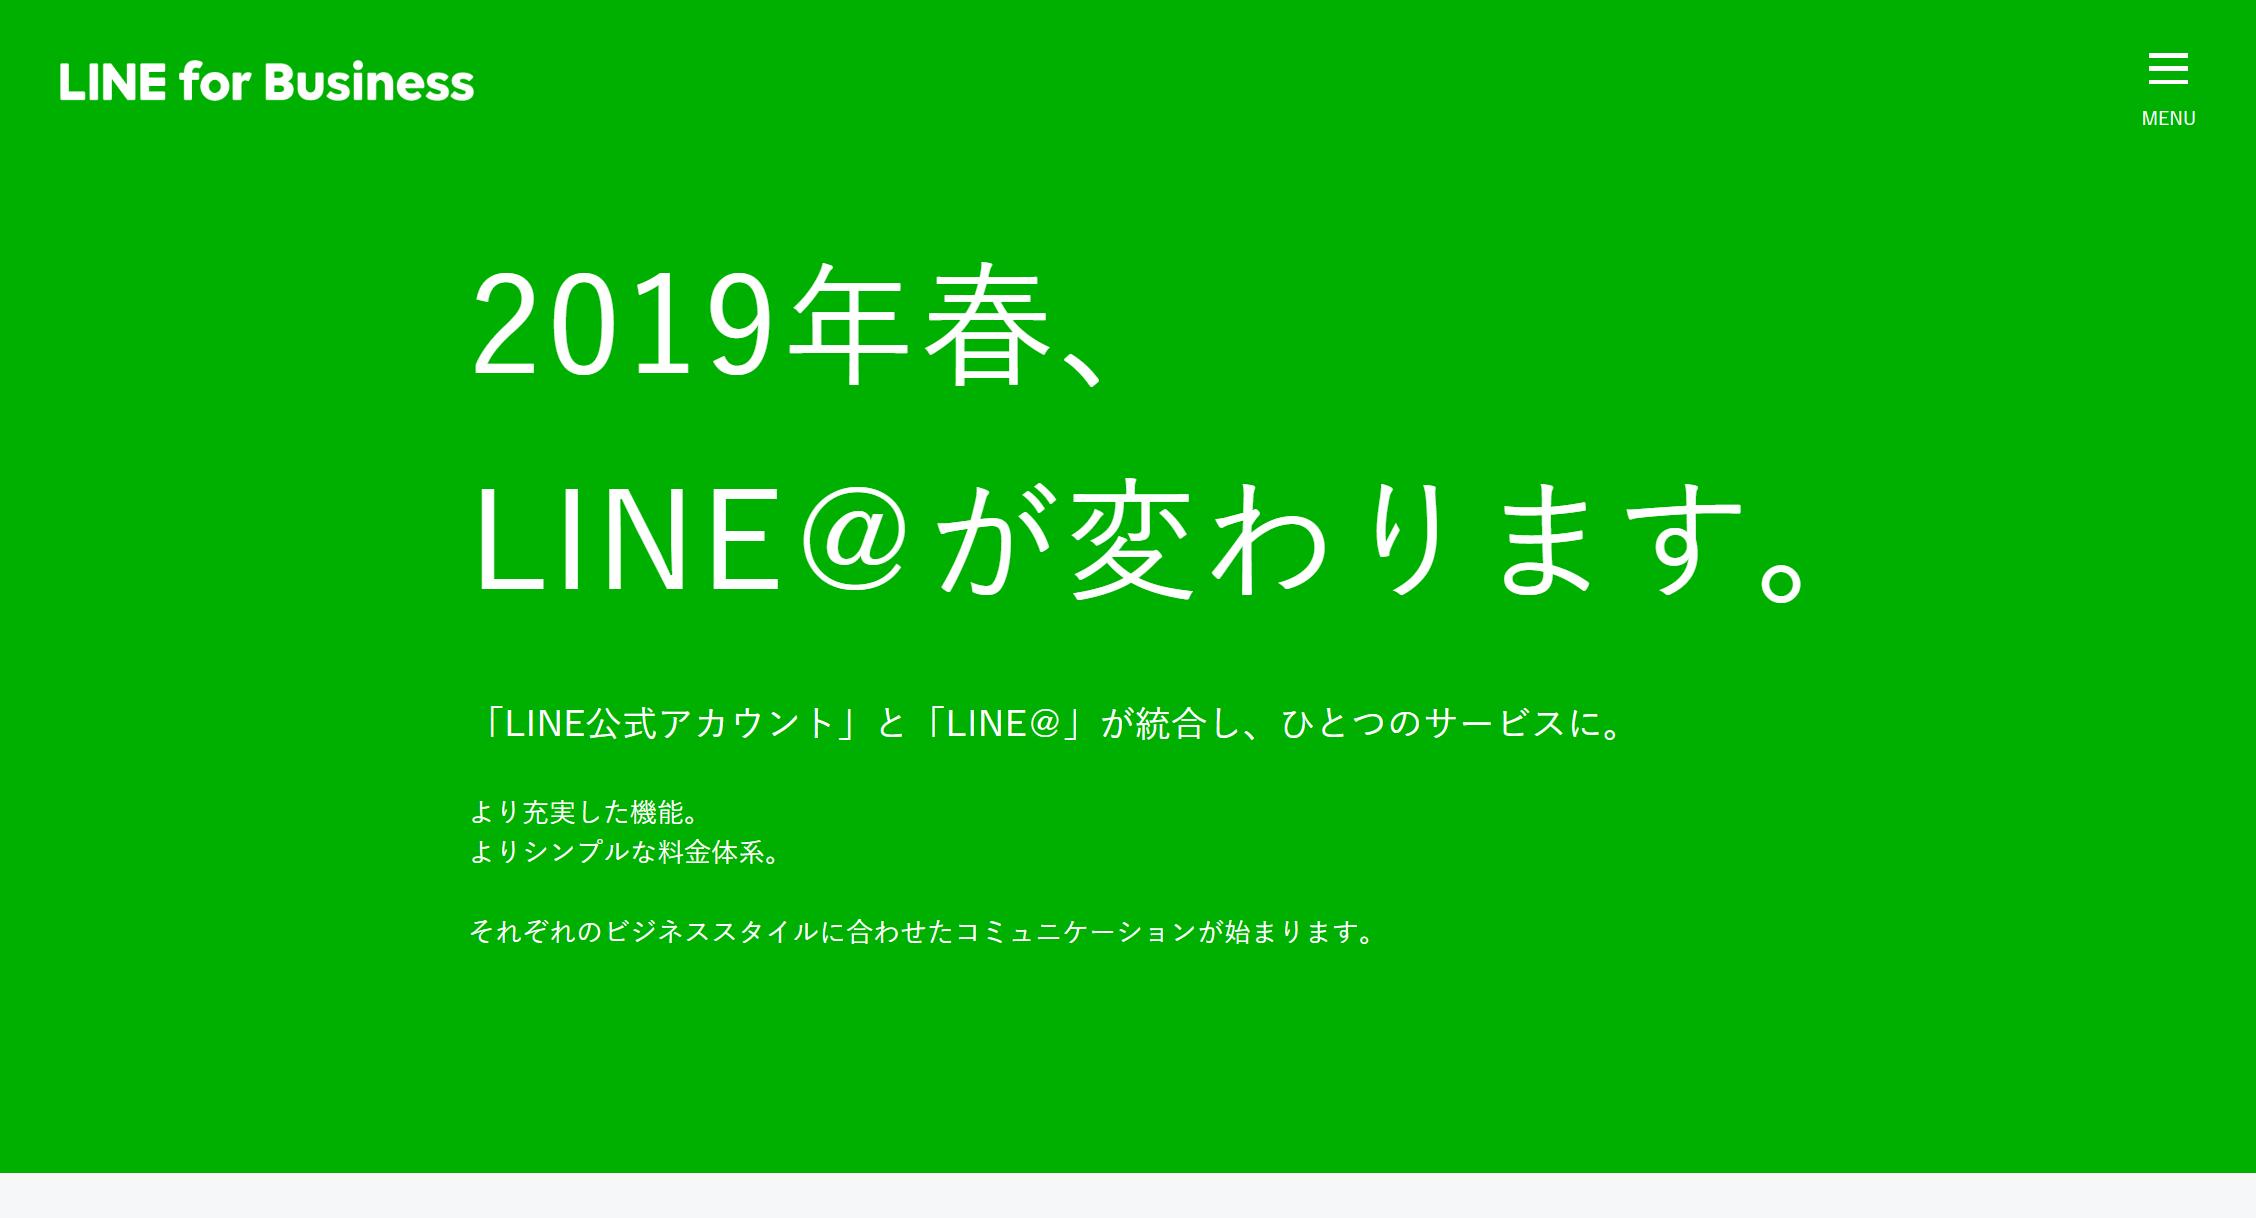 LINE 新料金,LINE 従量課金